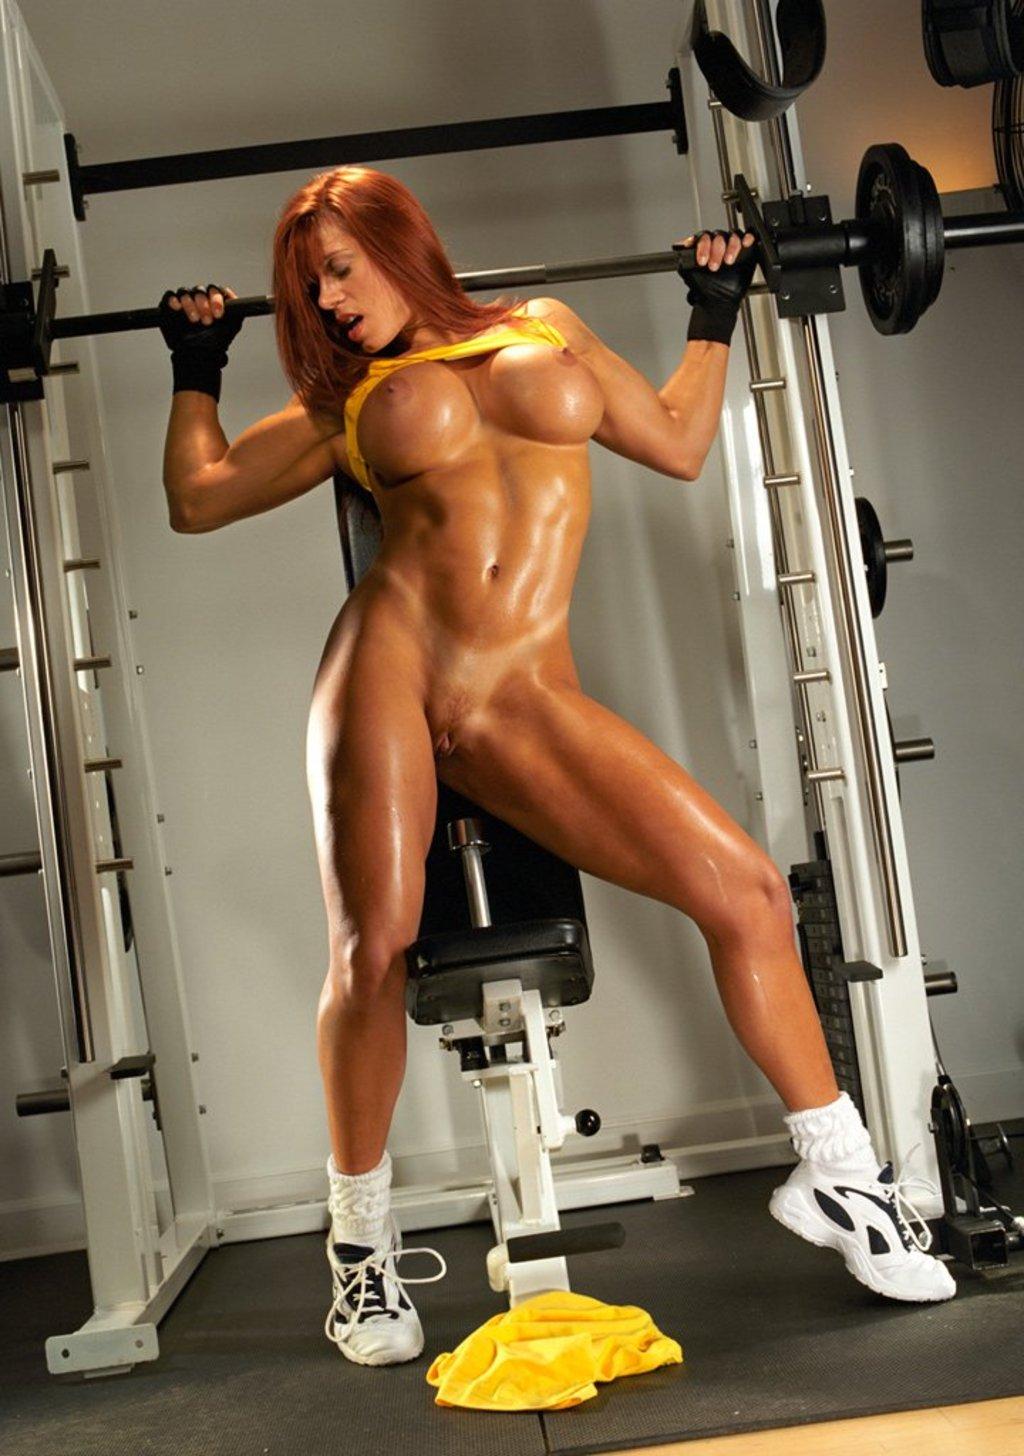 9-porno.ru Фото спортивных голых девушек